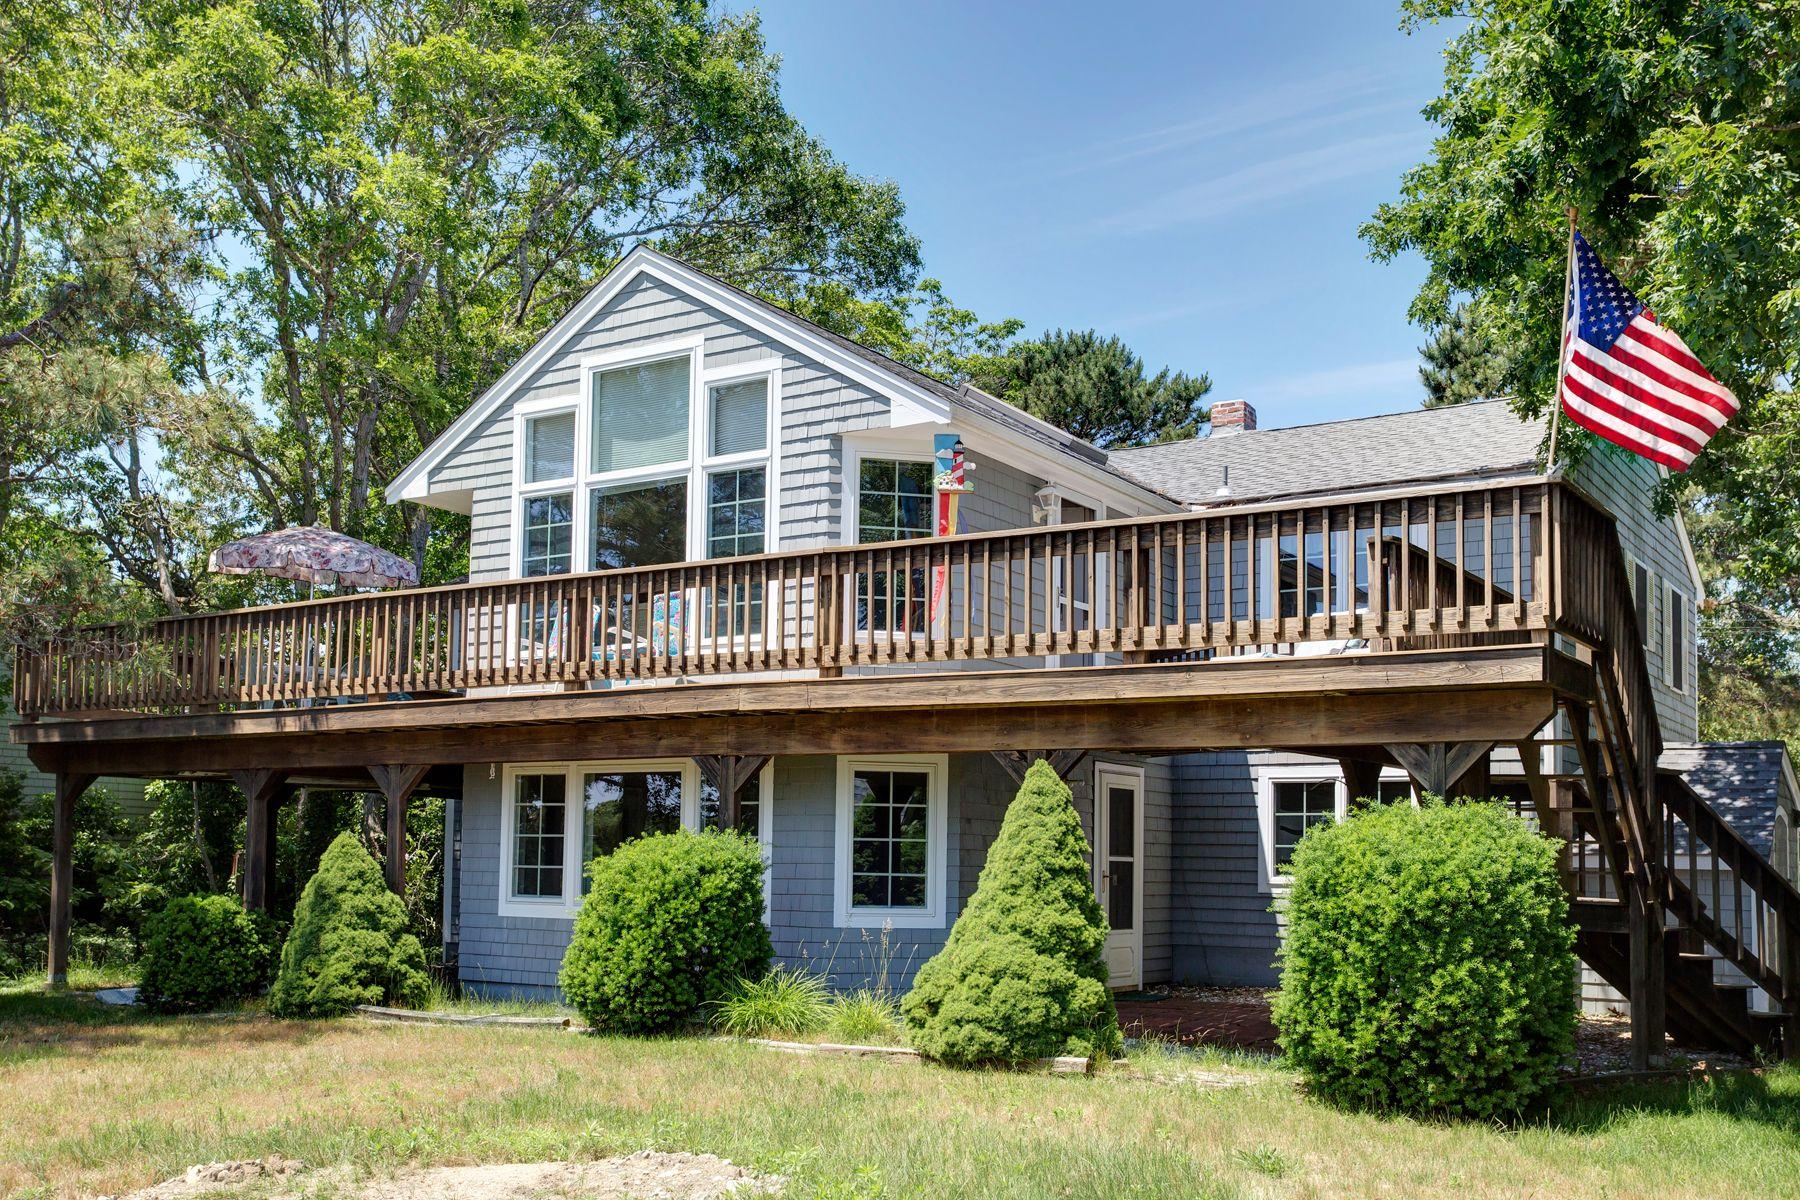 Single Family Homes for Sale at 256 Monomoscoy Road Mashpee, Massachusetts 02649 United States